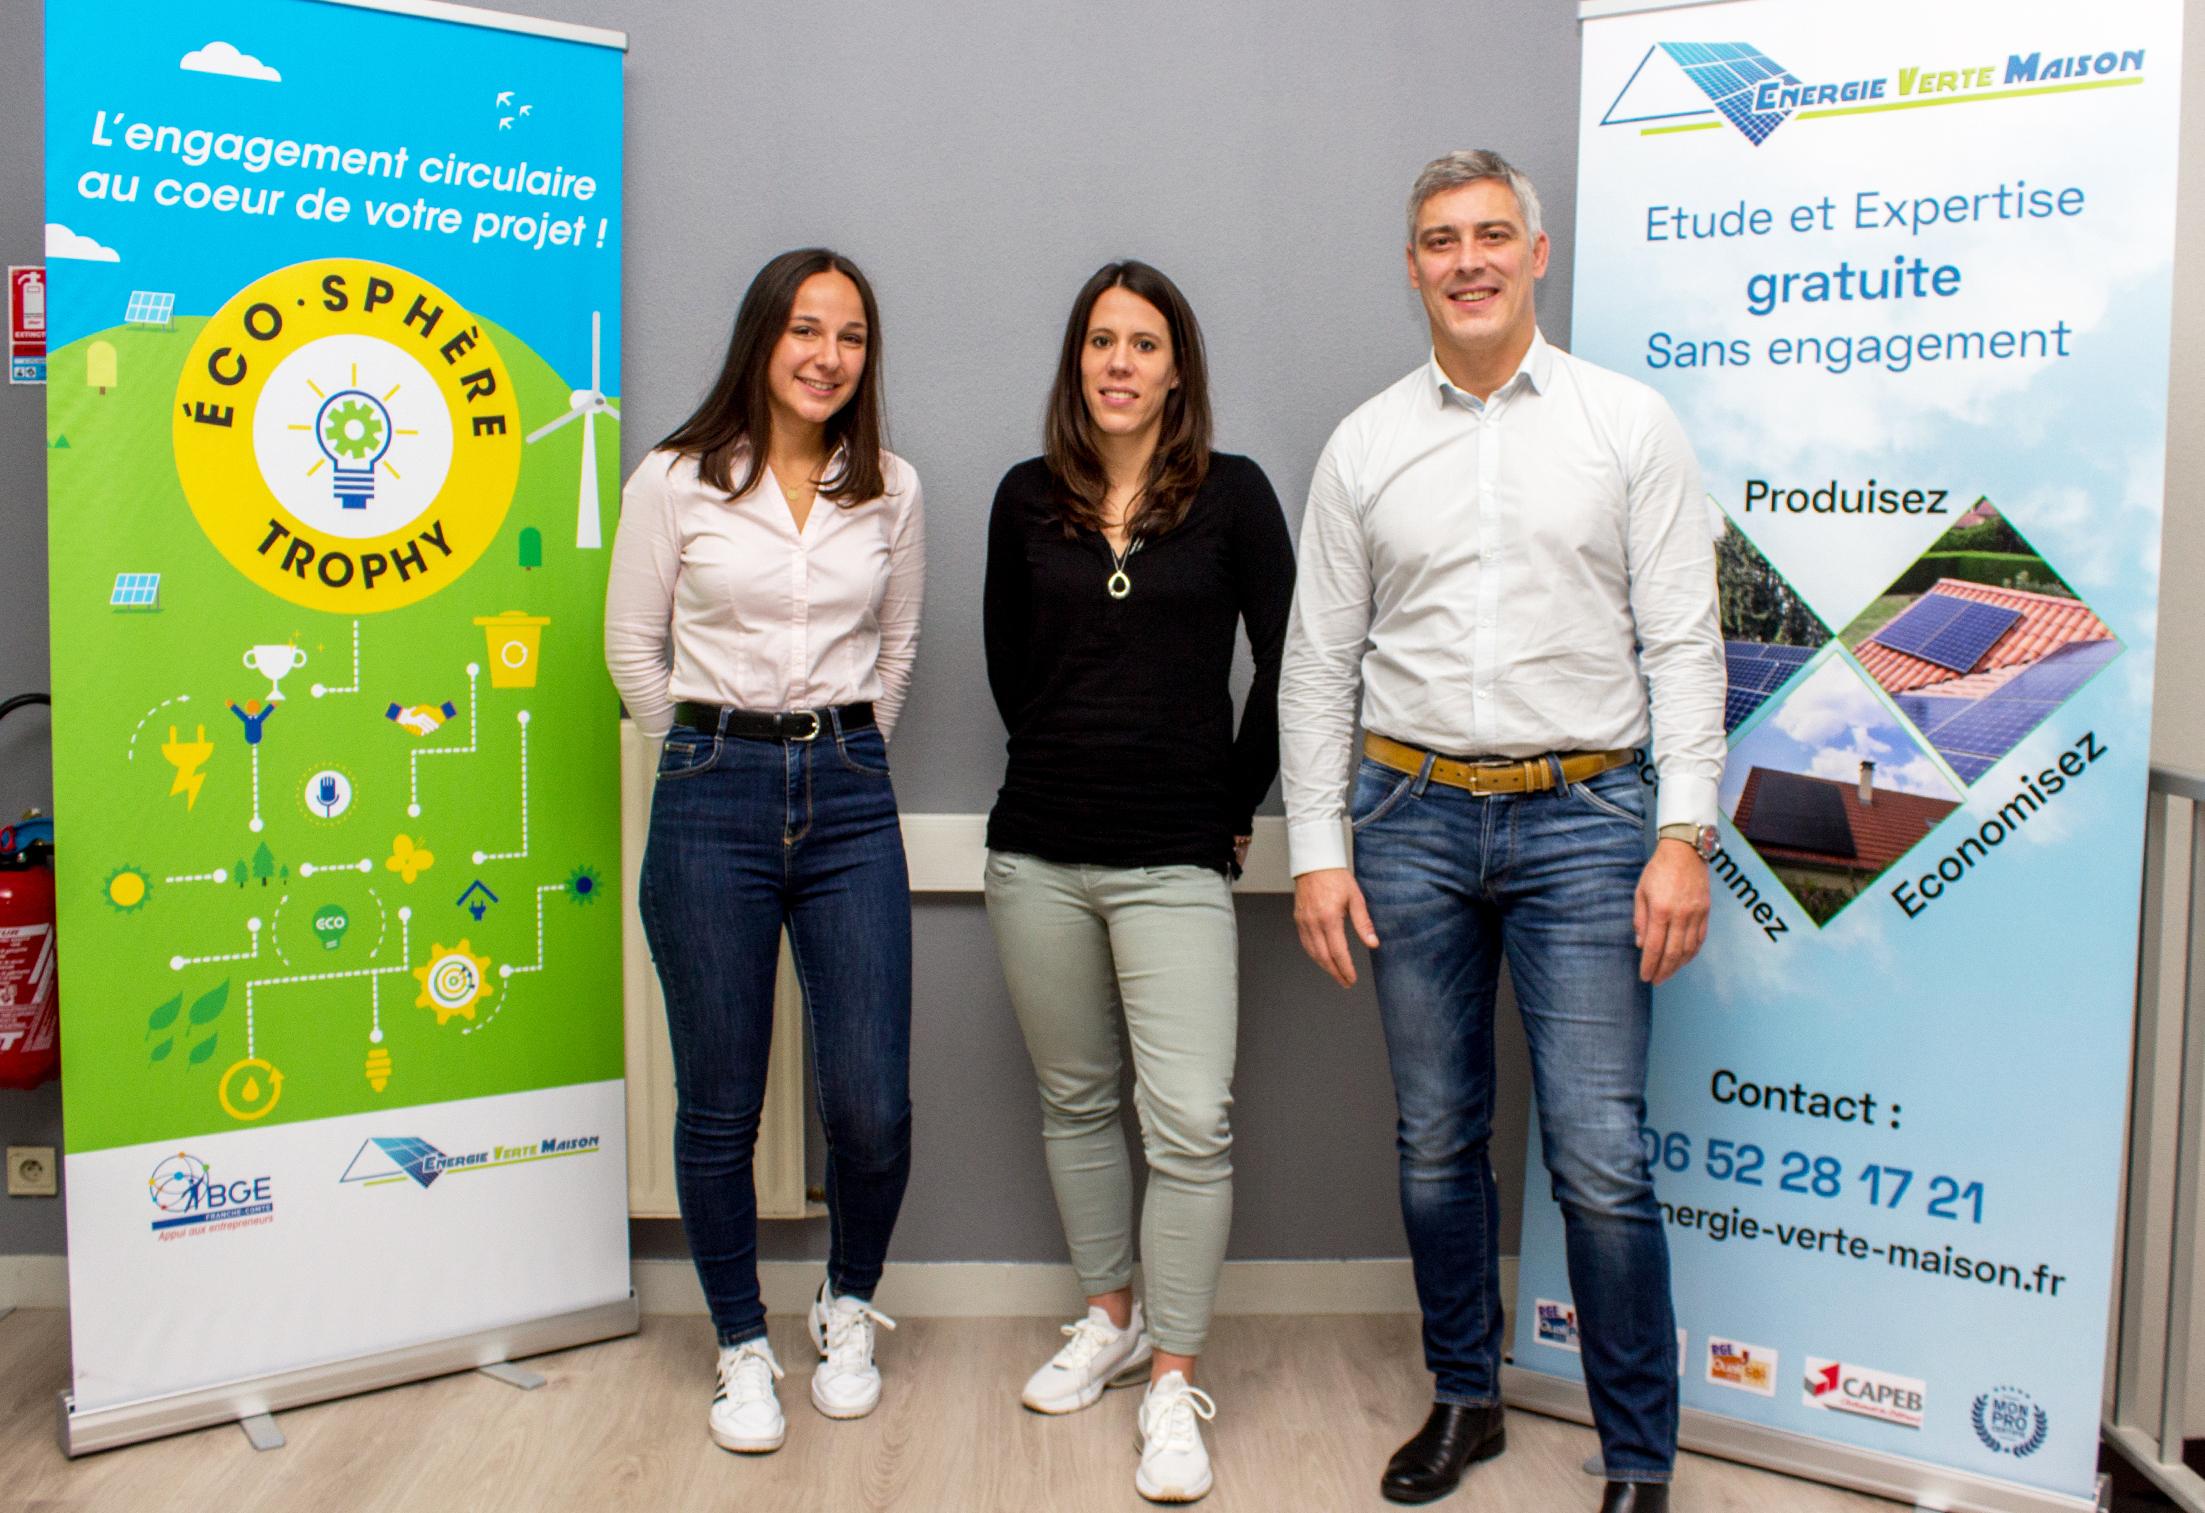 l'équipe energie verte maison